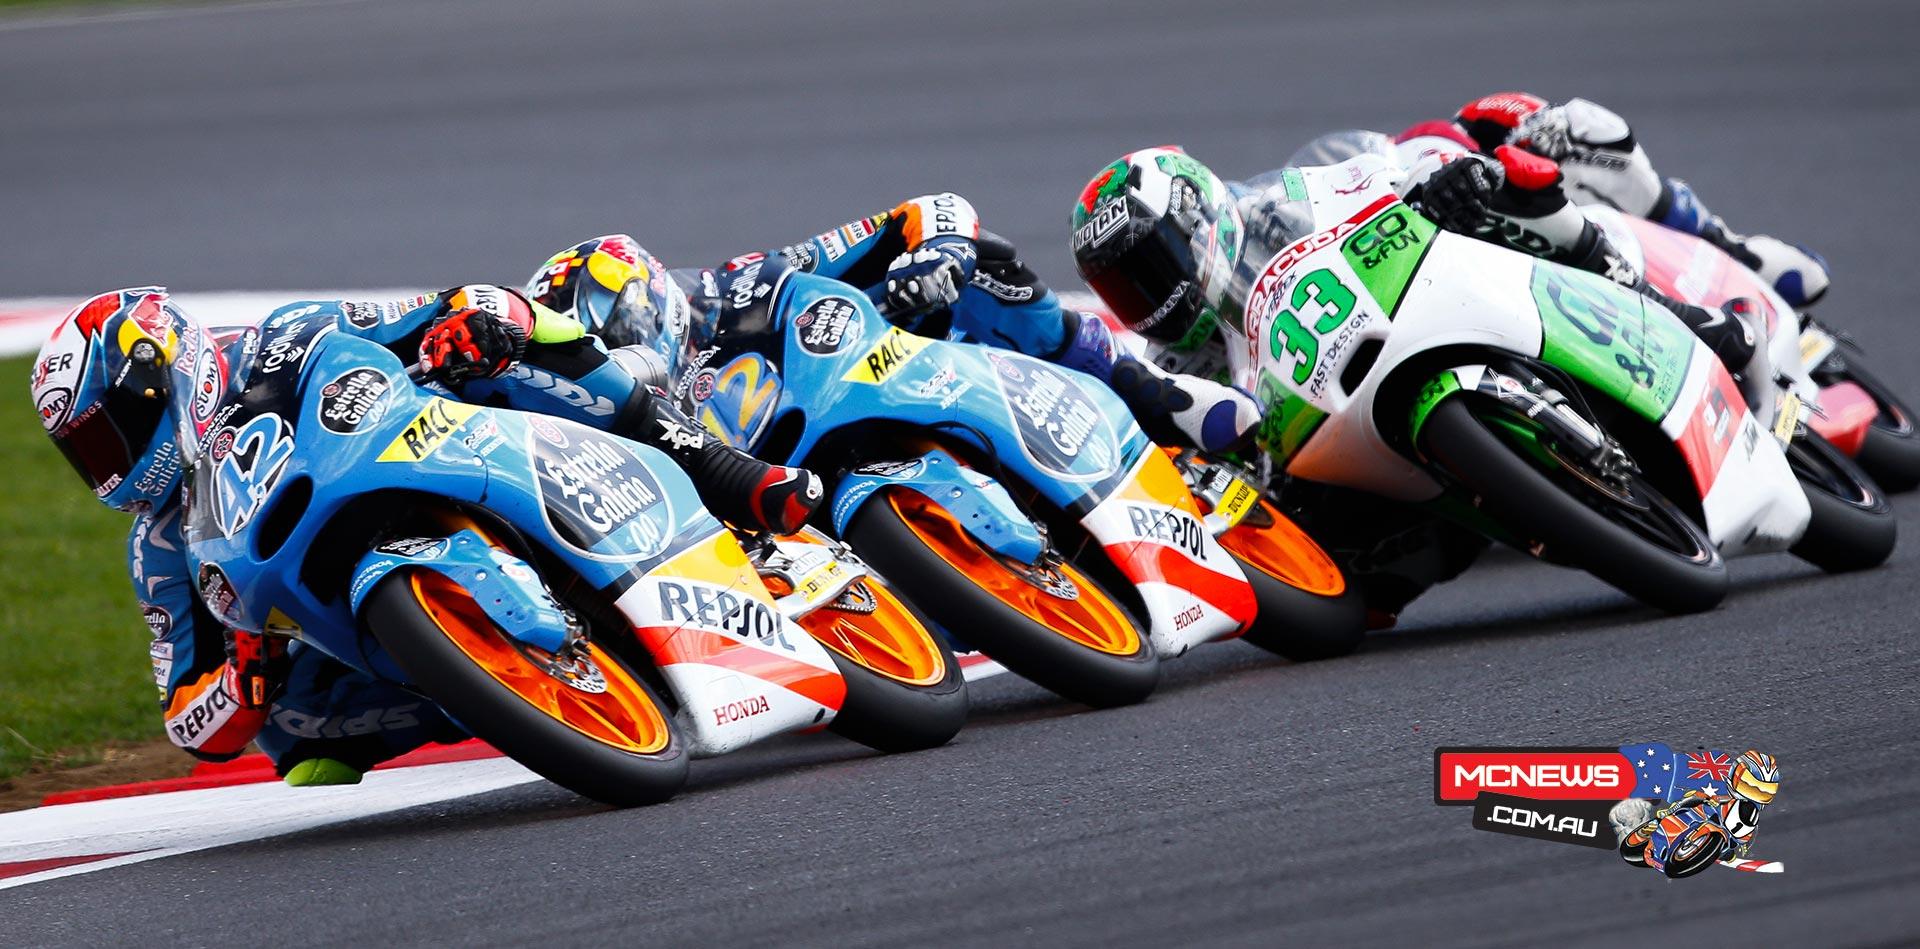 British Grand Prix to run at Silverstone | MCNews.com.au